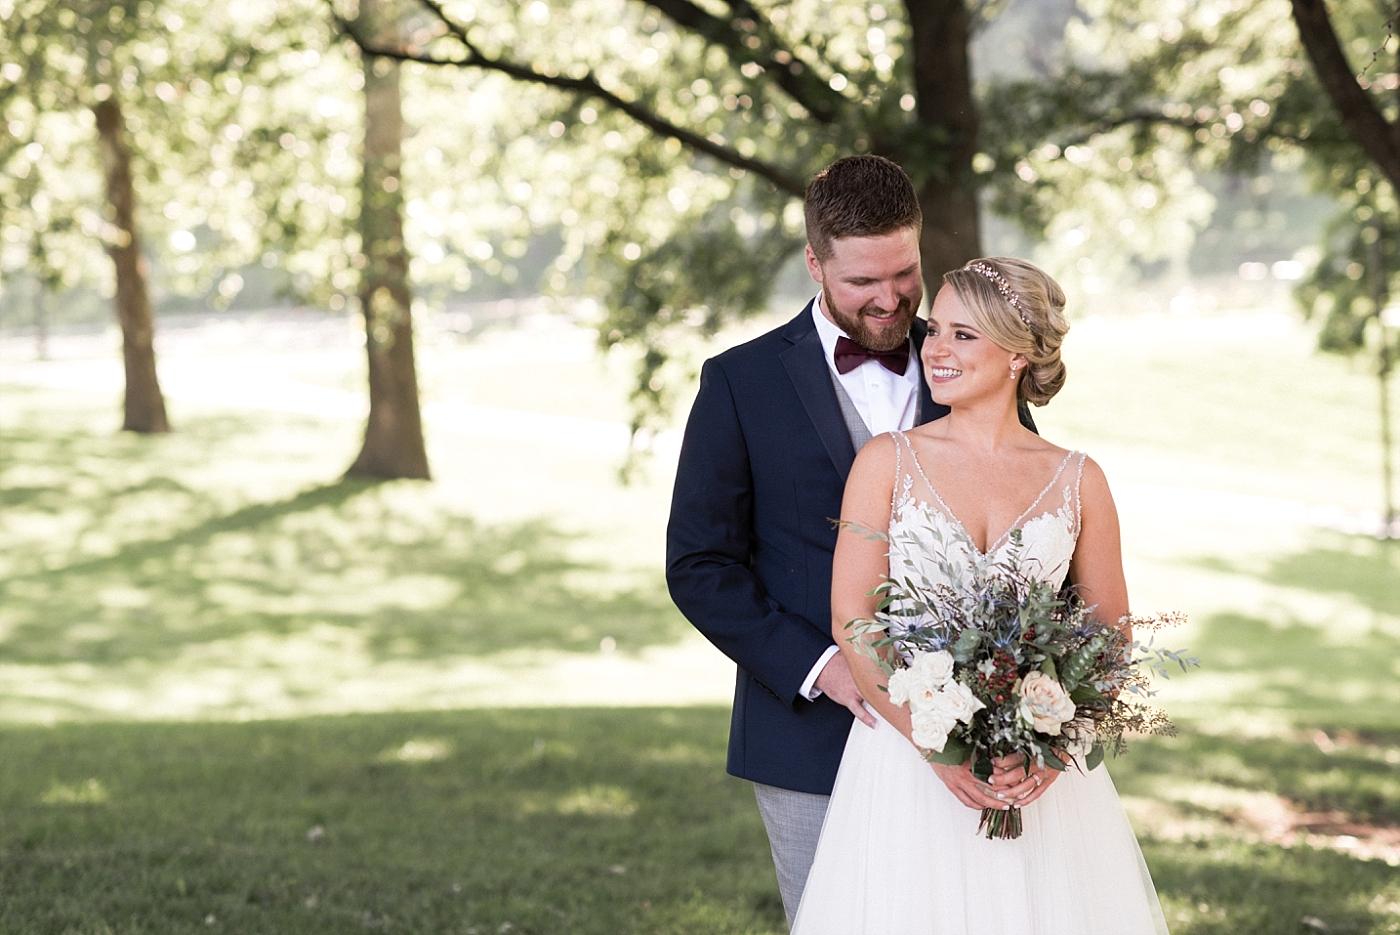 Bride groom wedding photography portrait bouquet